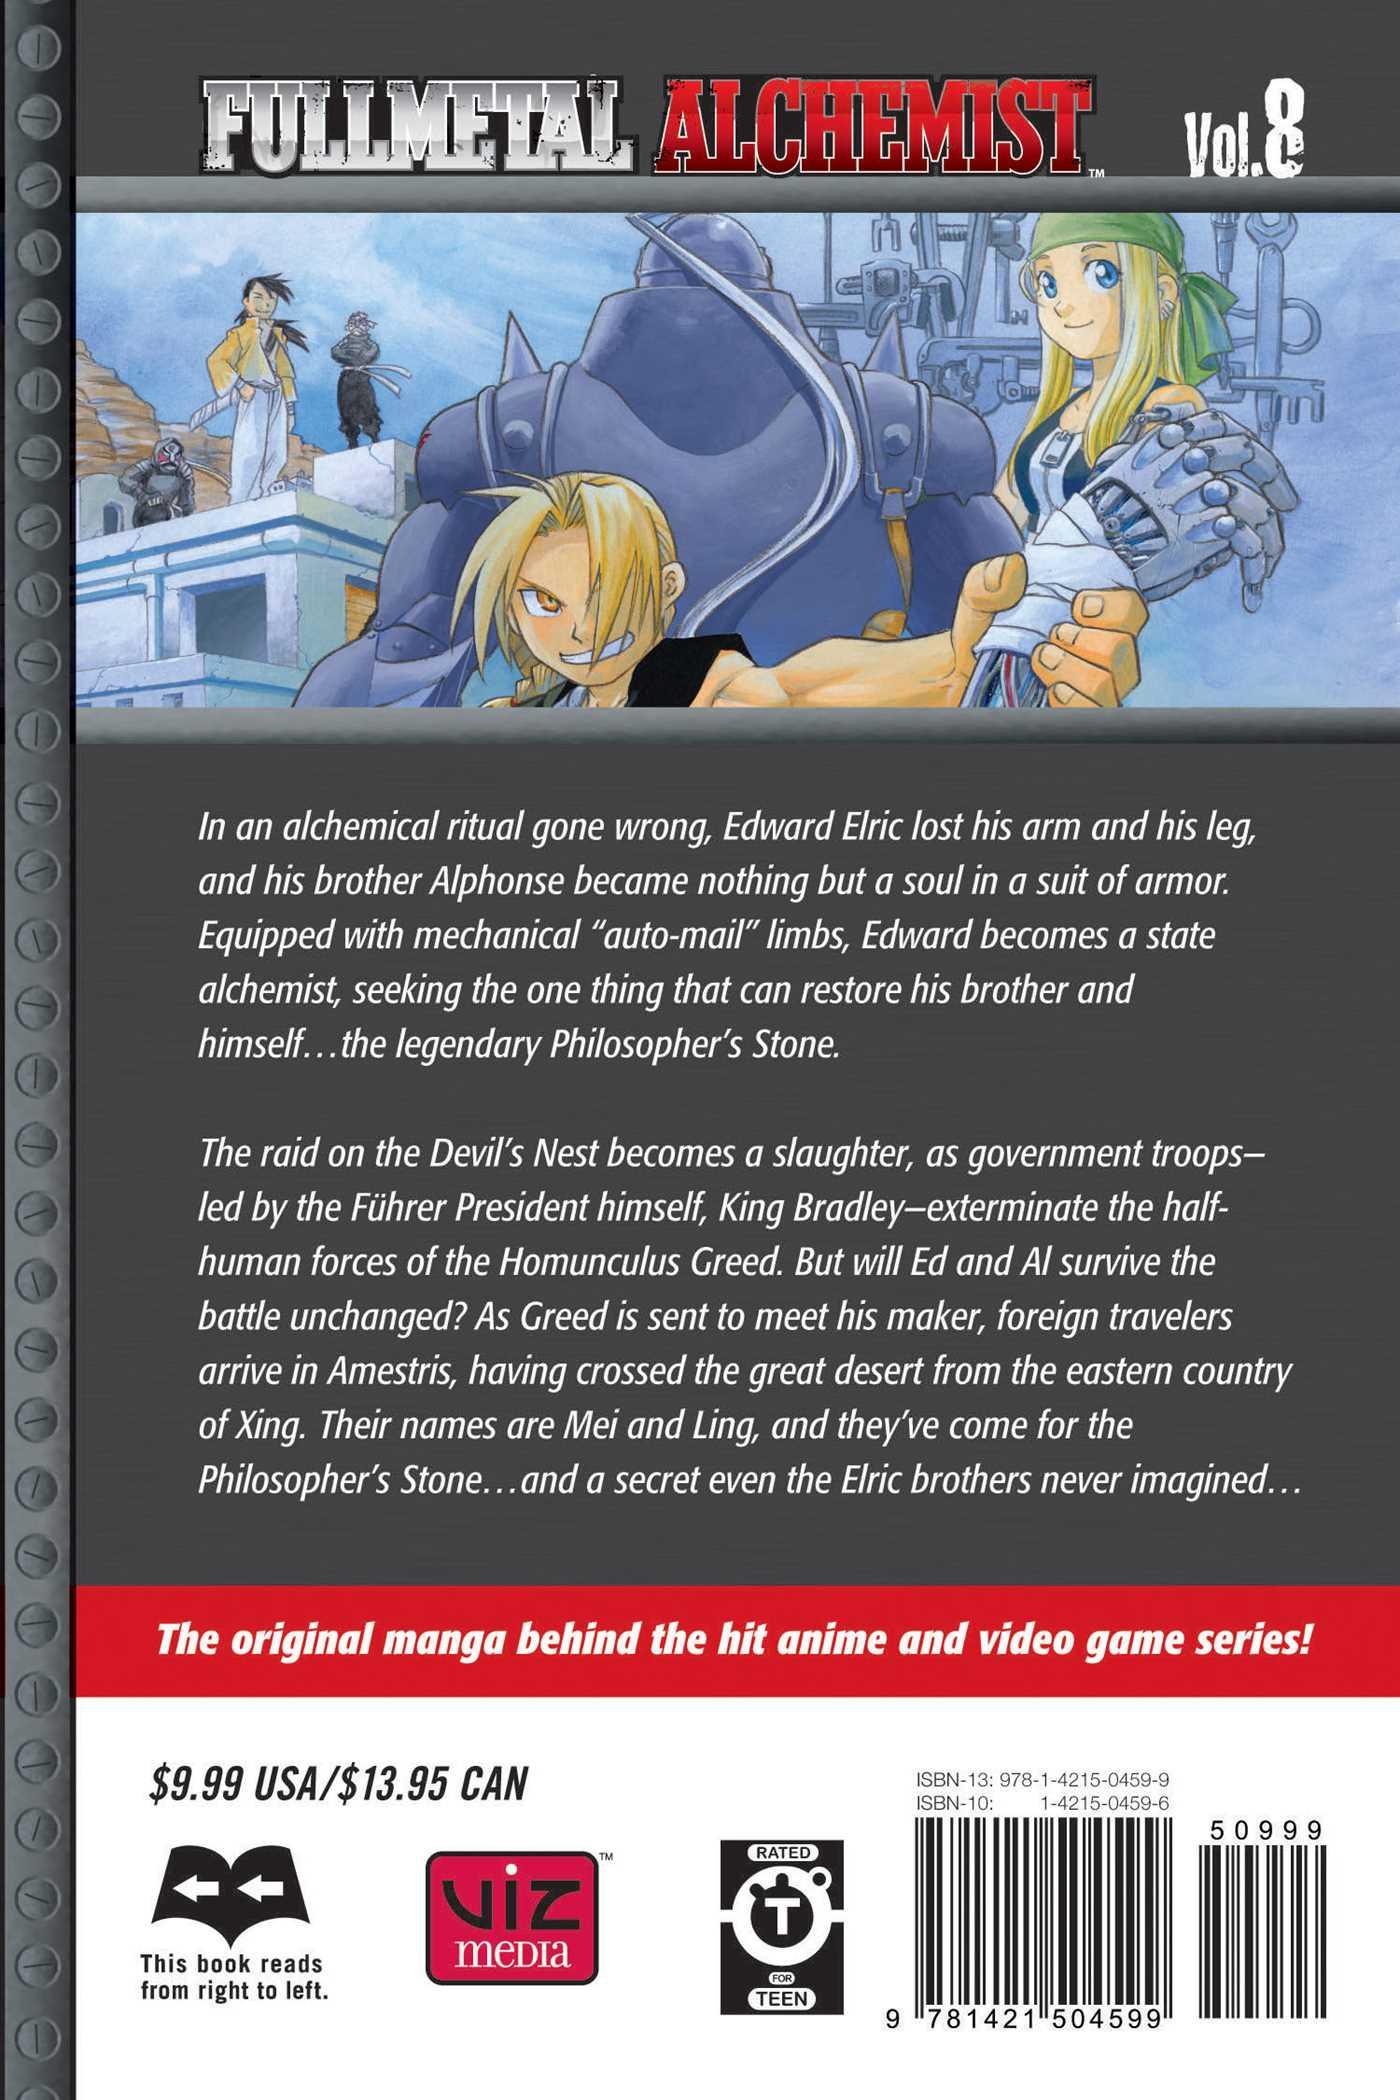 Fullmetal alchemist vol 8 9781421504599 hr back